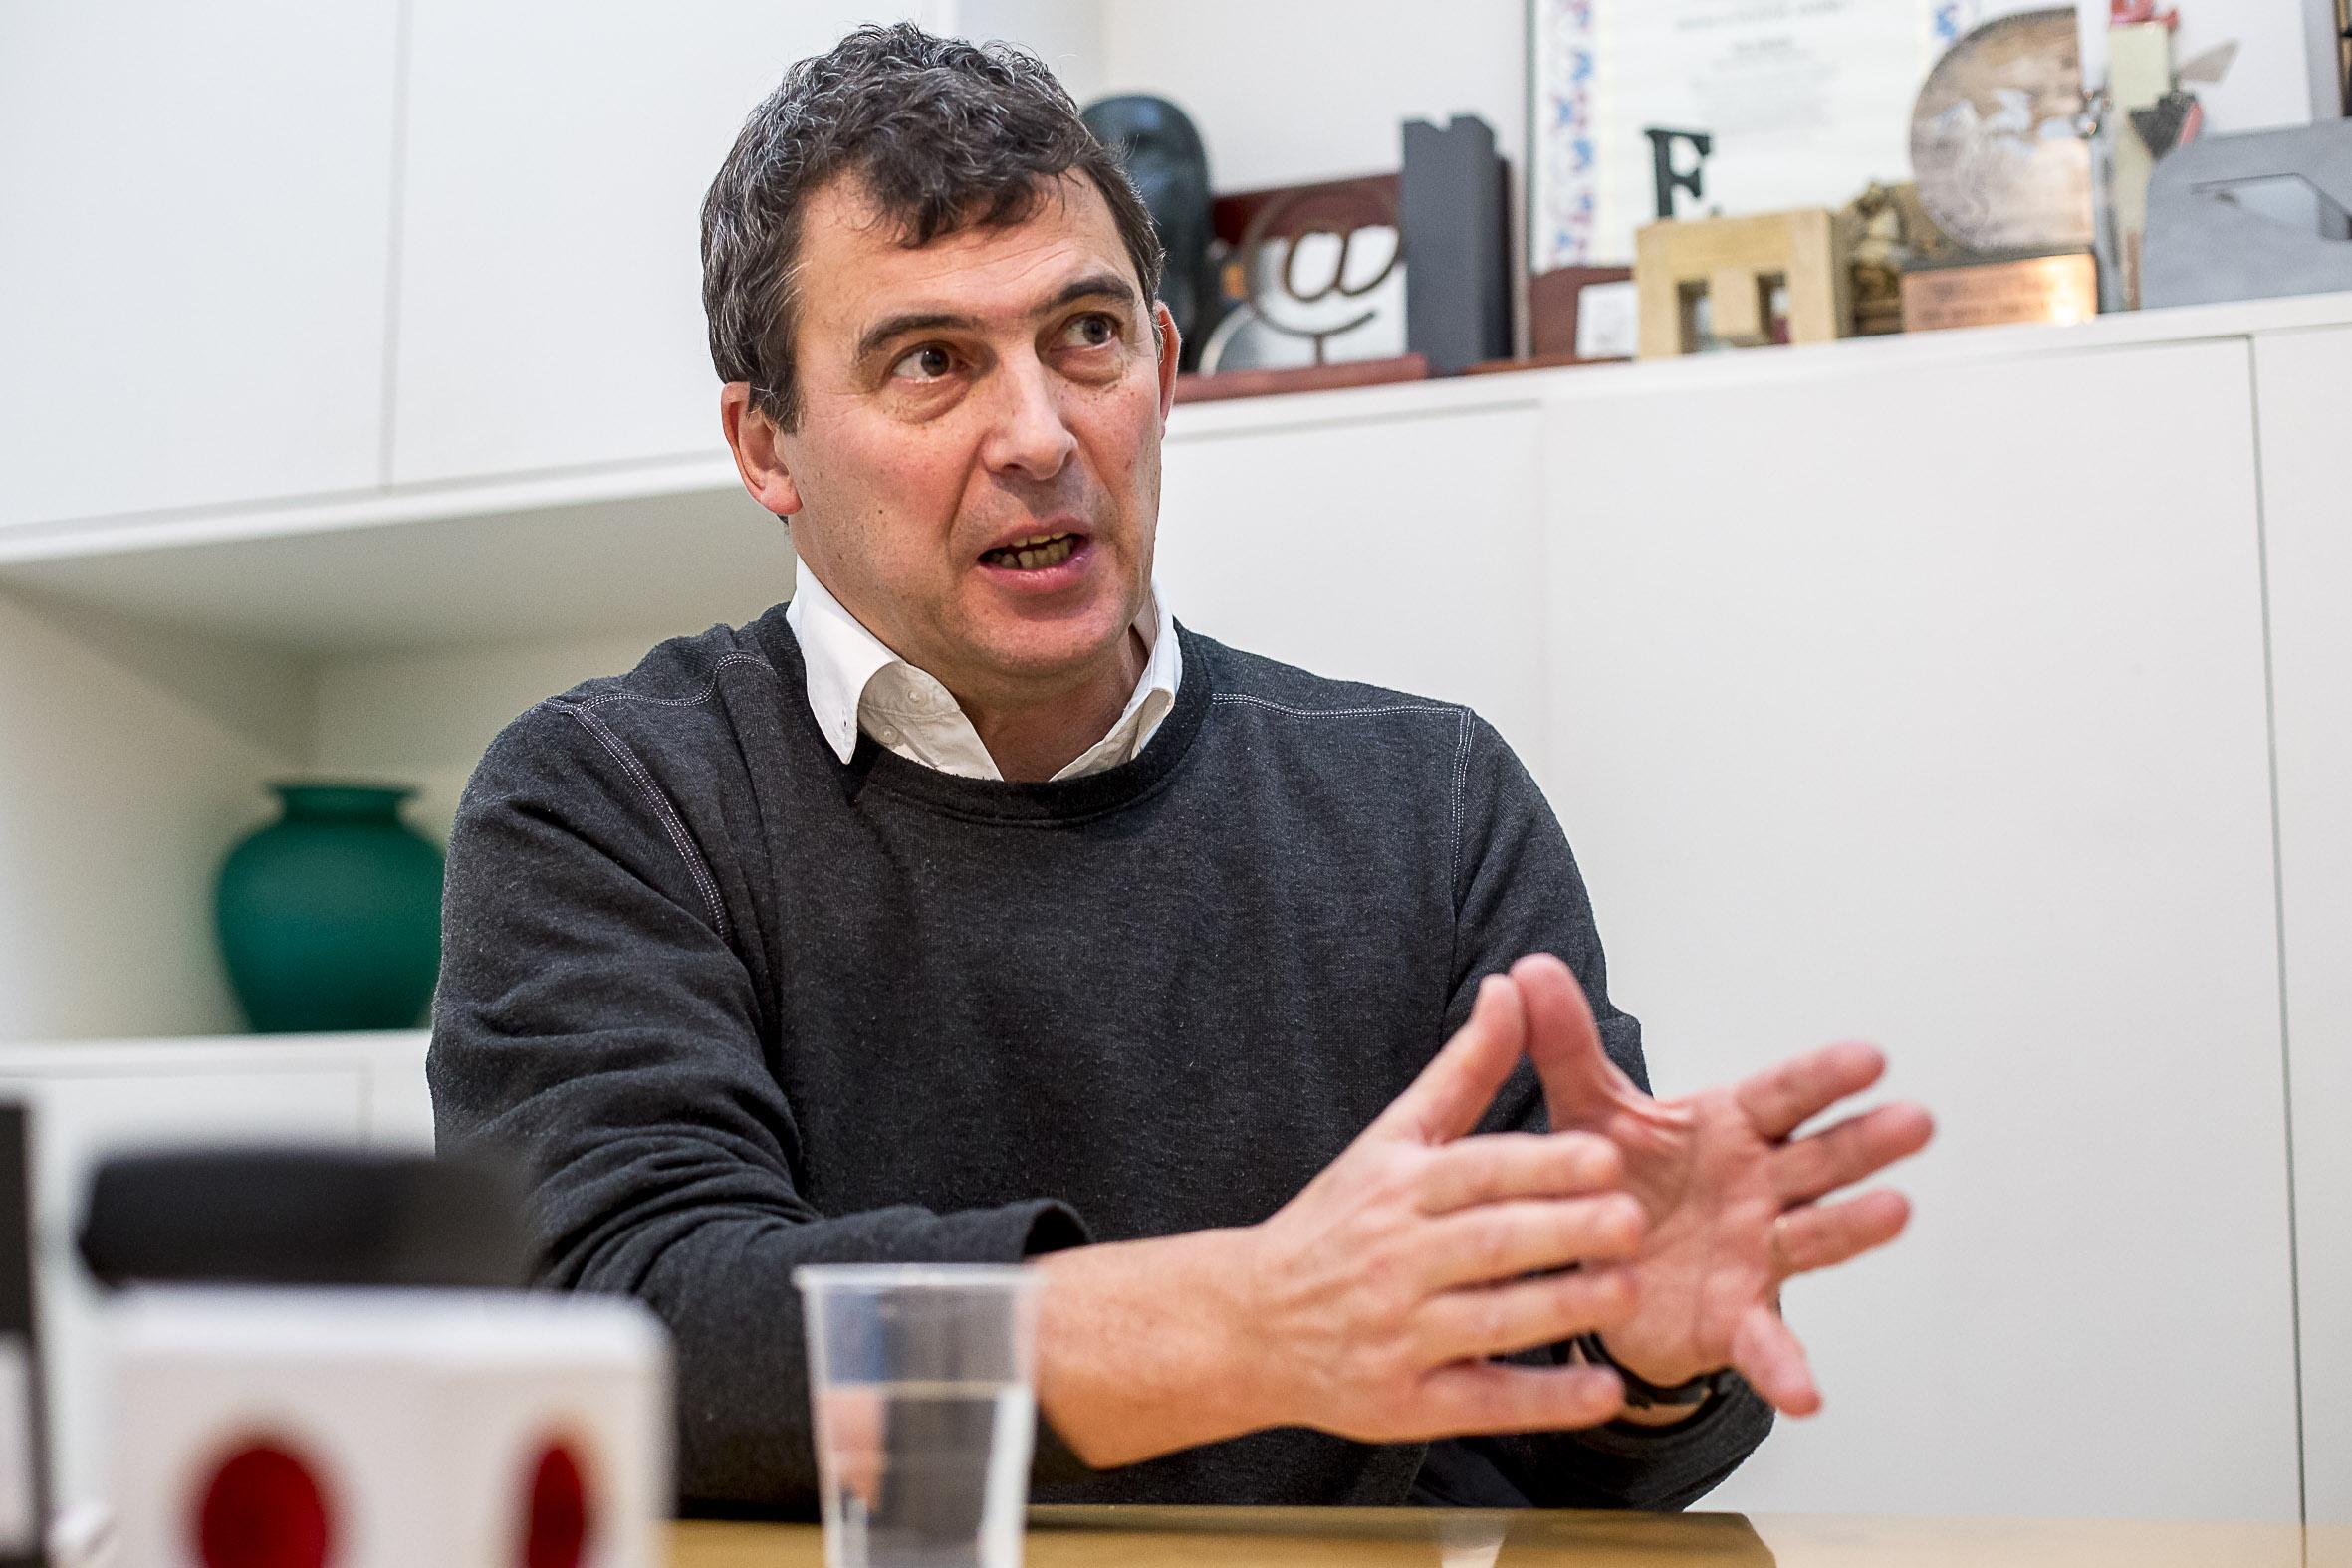 Éric Fassin